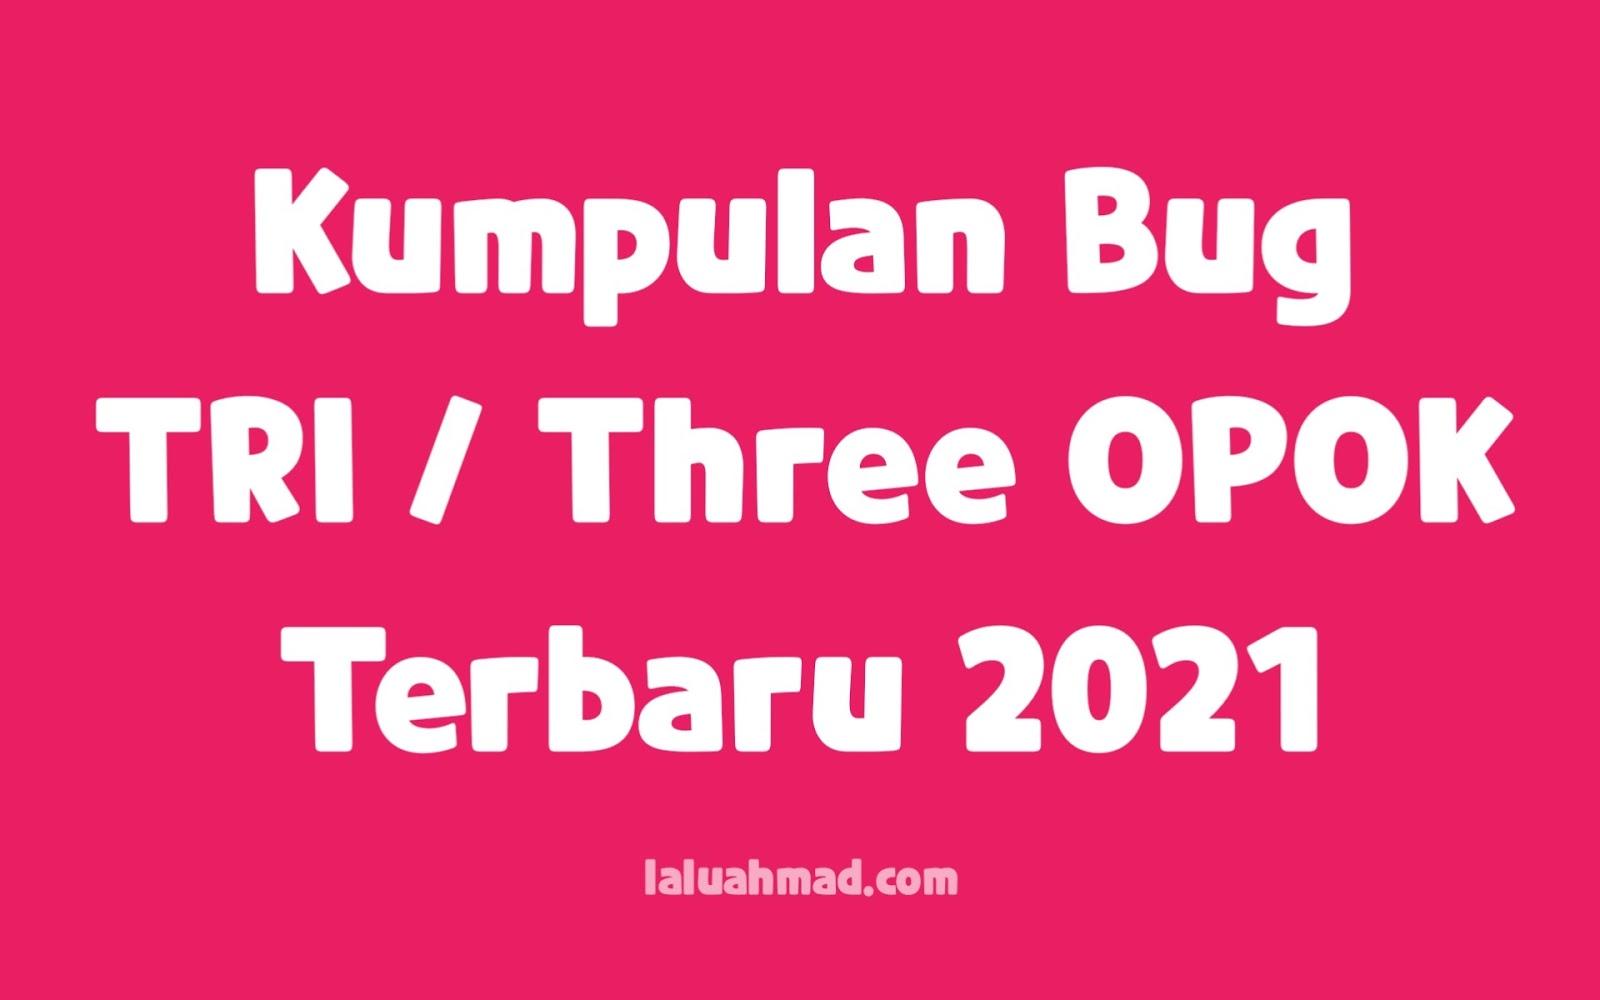 Kumpulan Bug TRI / Three OPOK Terbaru 2021